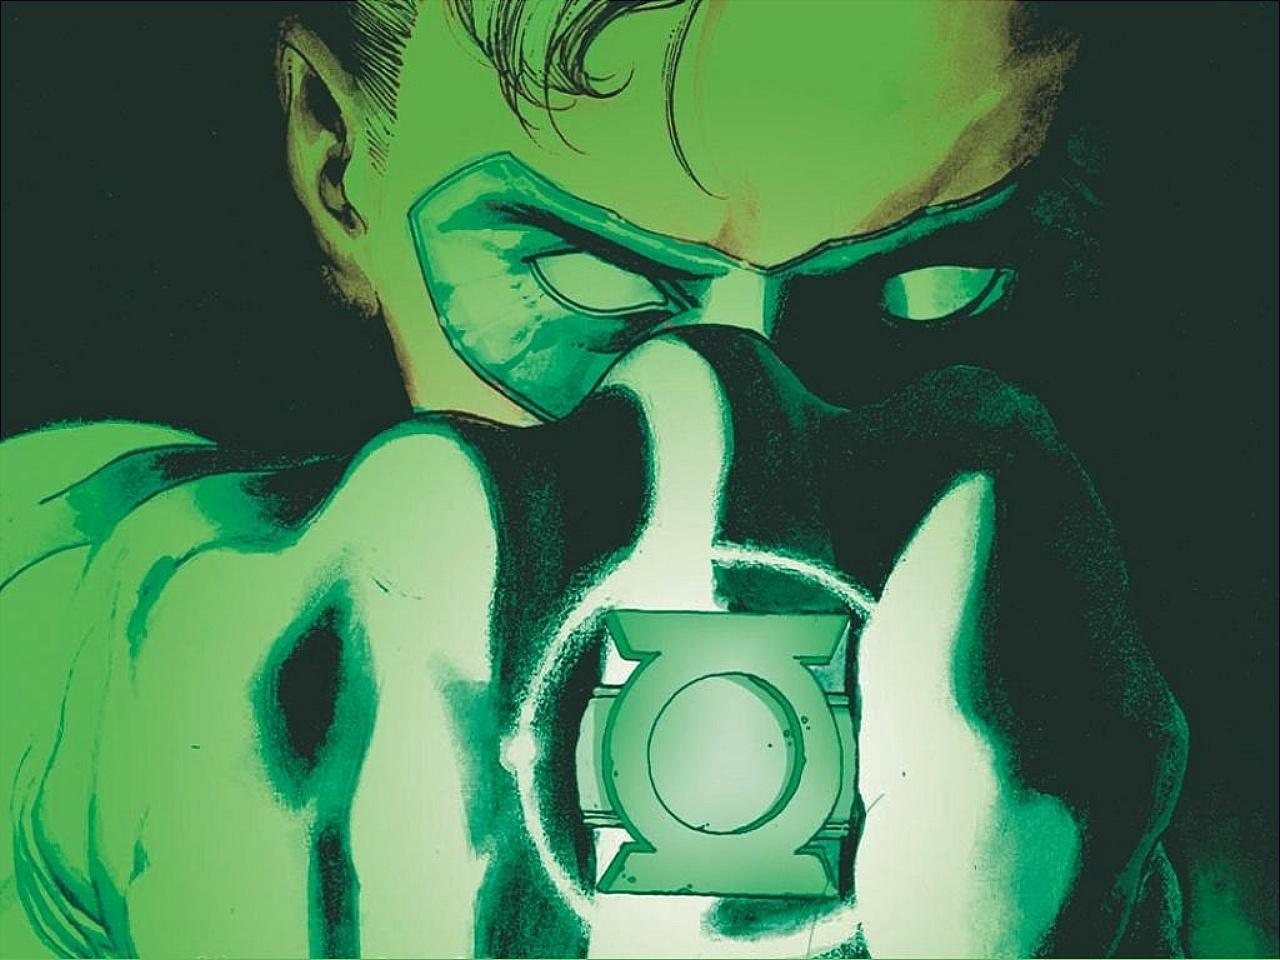 Green Lantern the green lantern corps 16566886 1280 960jpg 1280x960